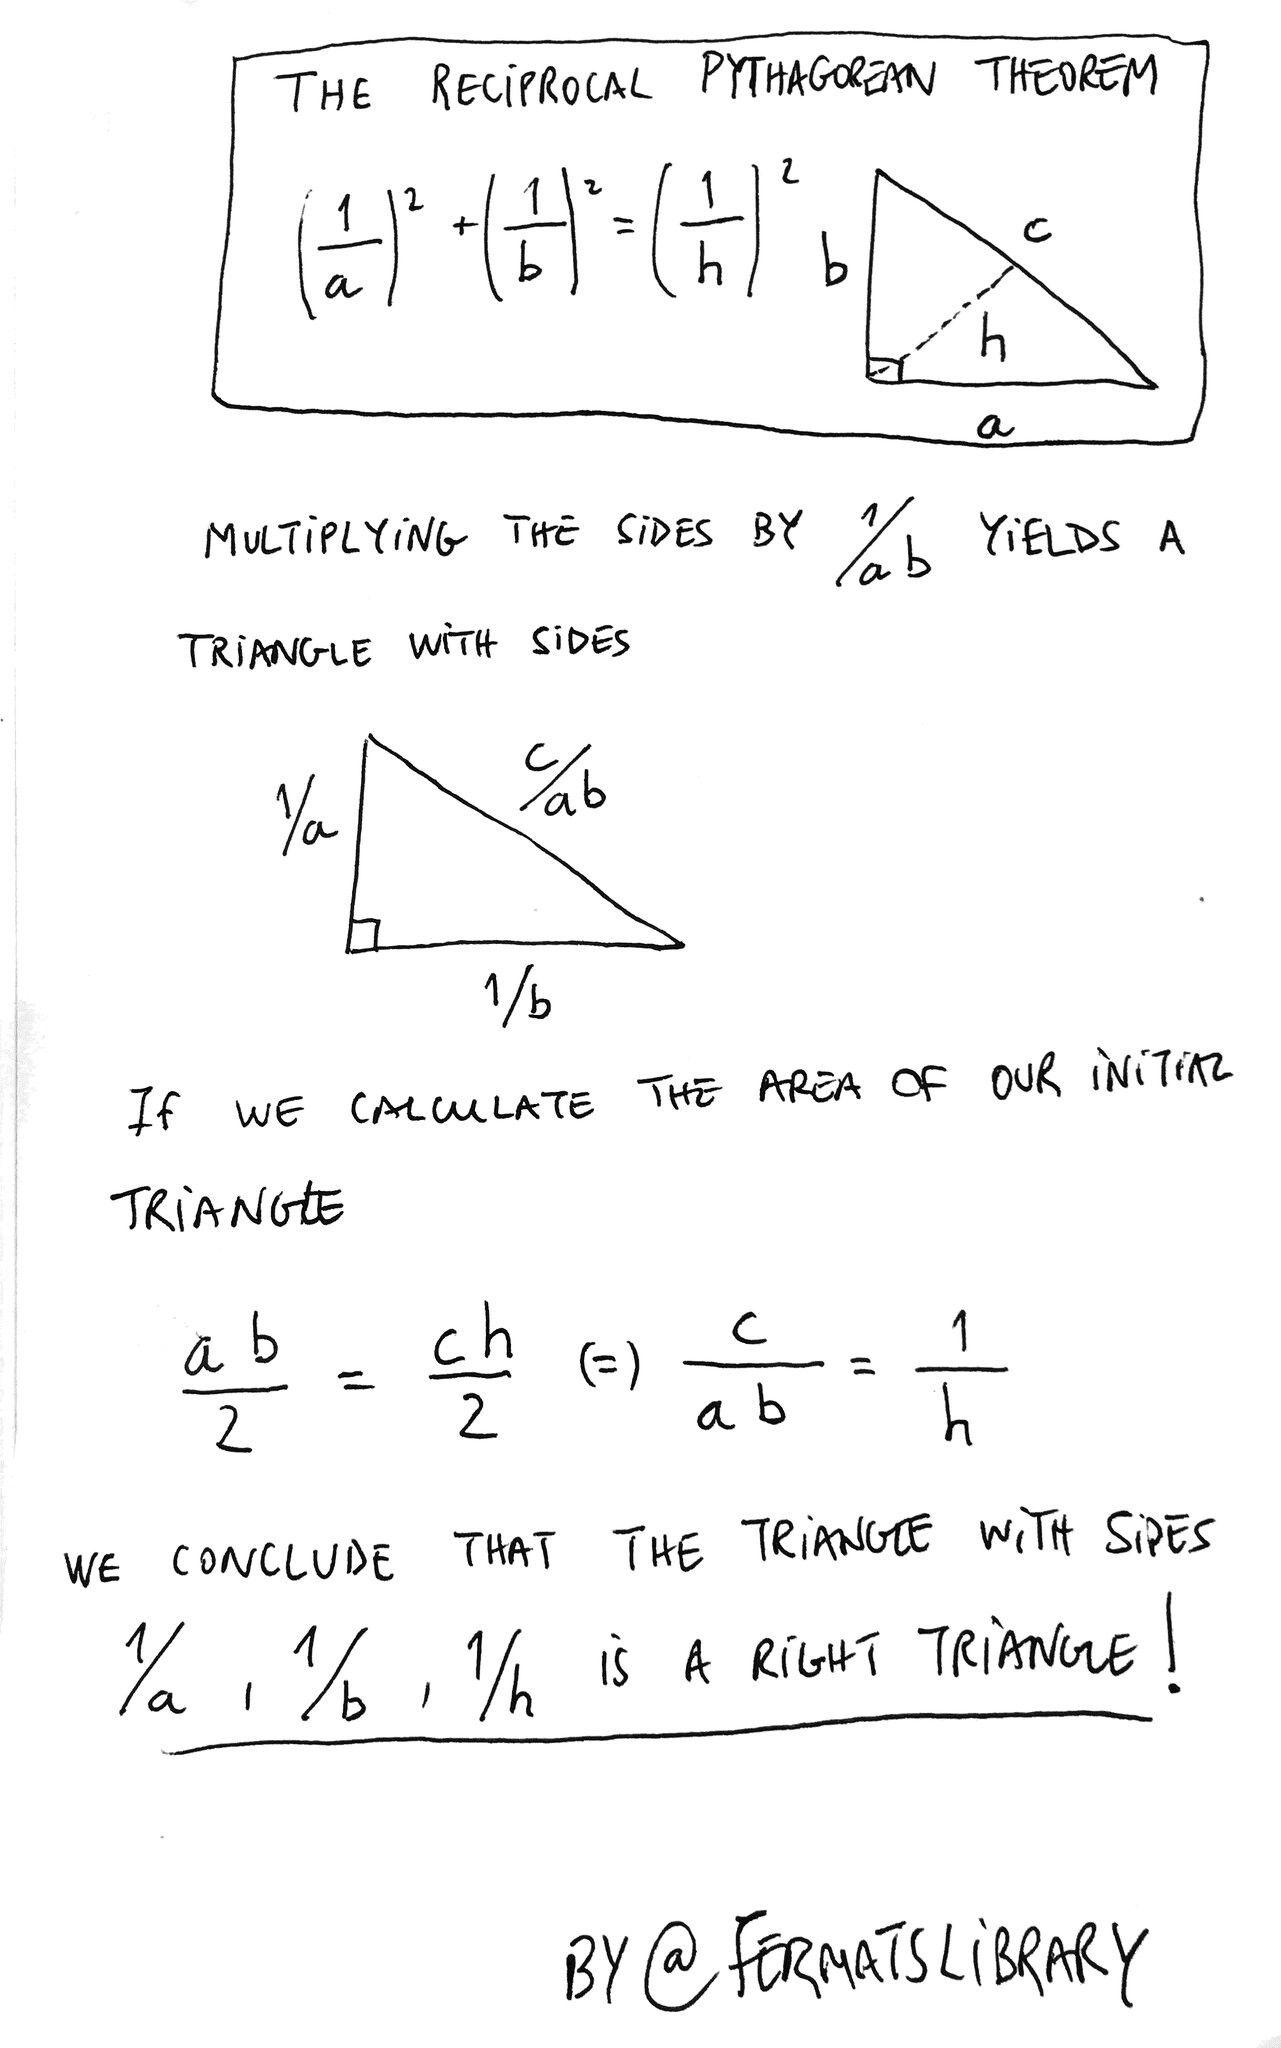 Reciprocal pythagorean theorem (With images) Mathematics